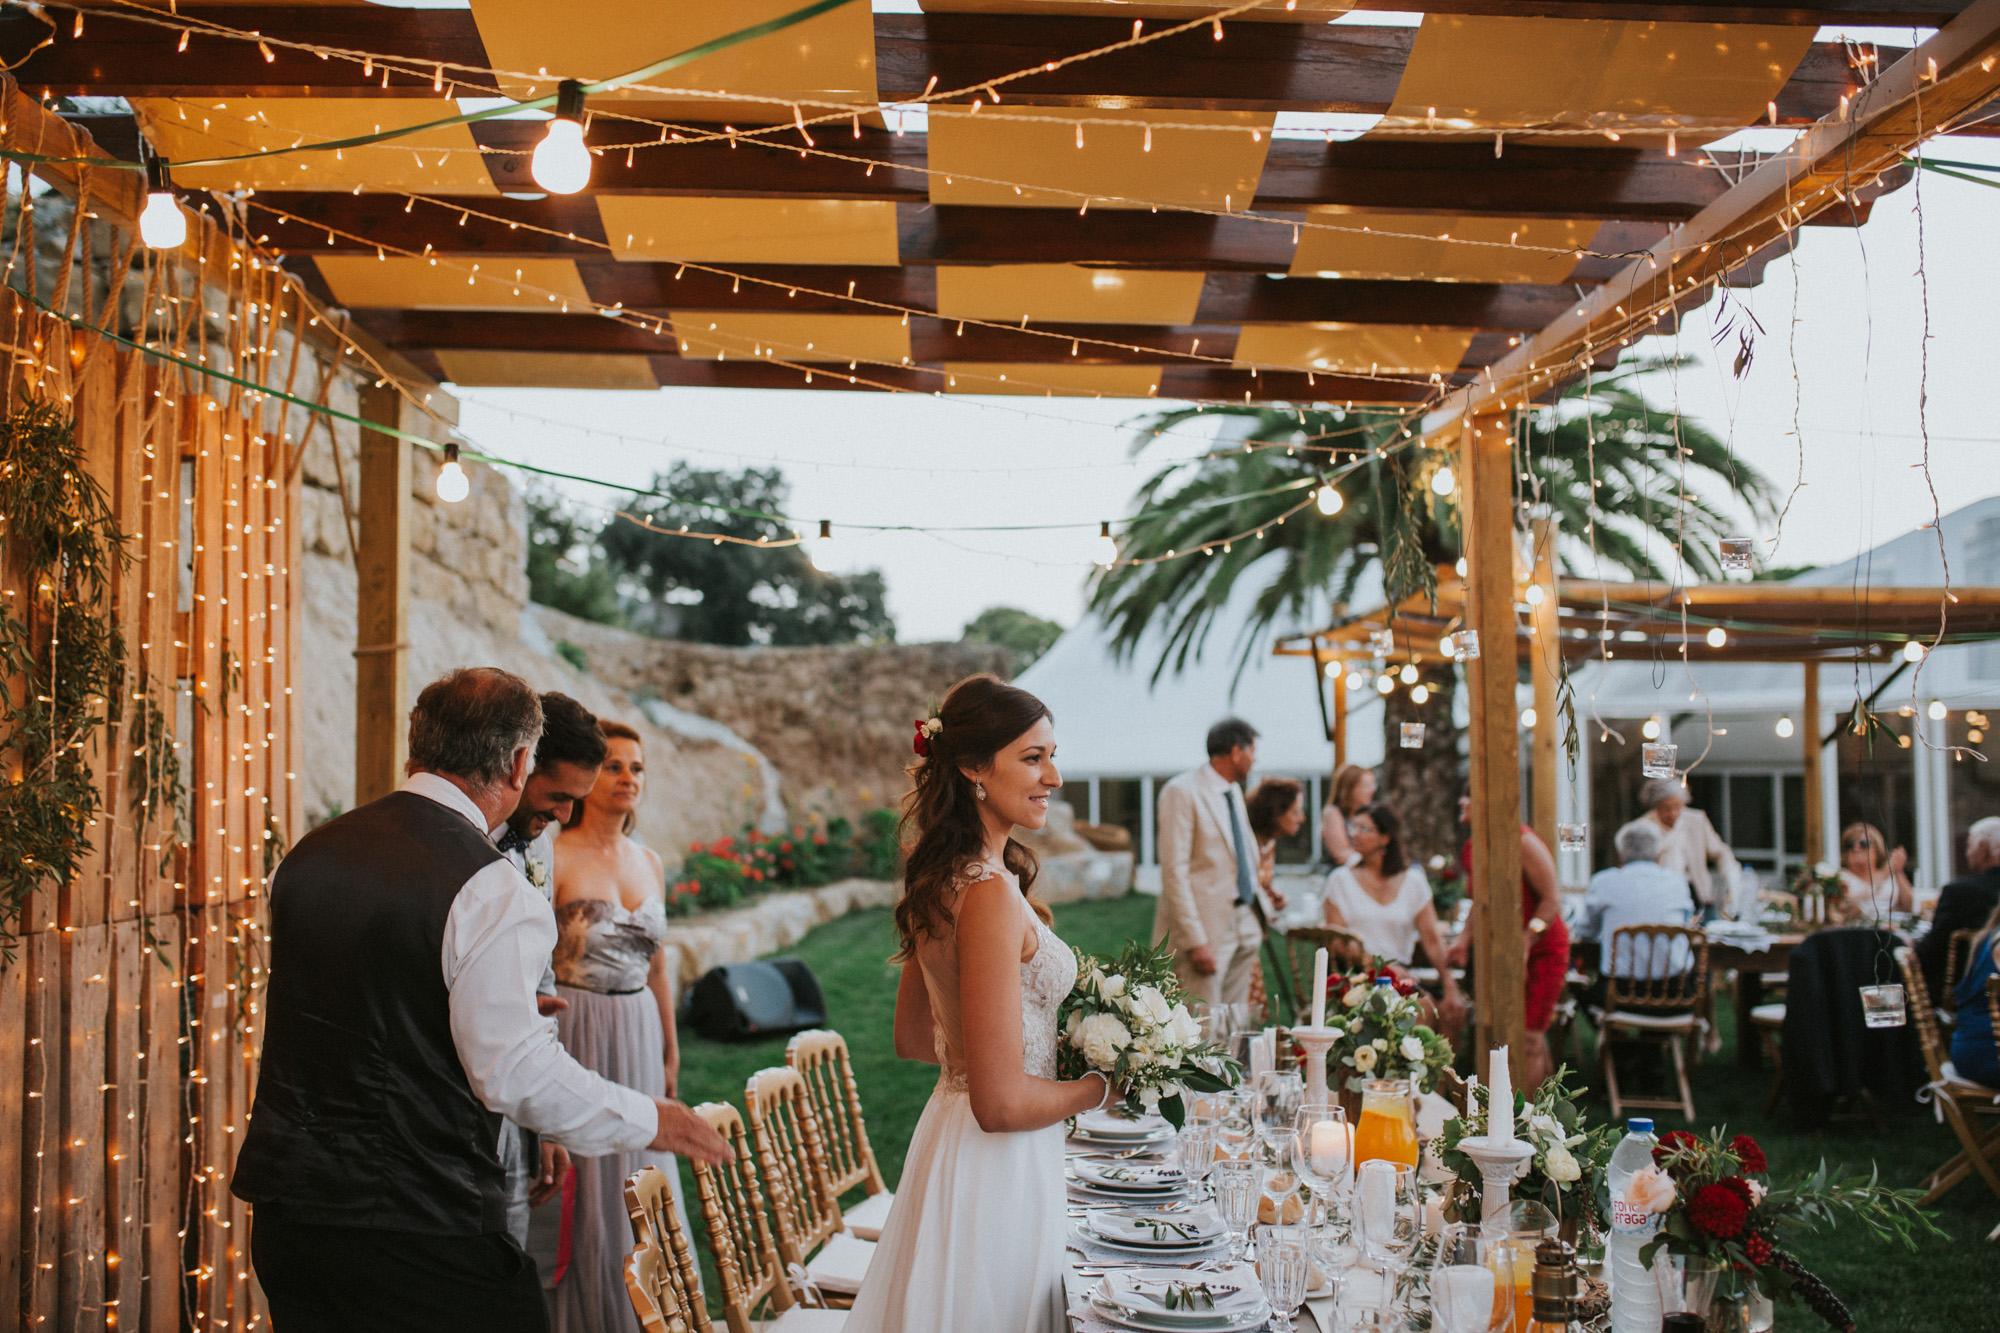 016-carina-e-samuel-wedding-casamento-quinta-dos-rouxinois-rustico-my-fancy-wedding-mafra-malveira-lisboa-sintra-cascais-filipe-santiago-fotografia-fotografo-lifestyle-destination-portugal